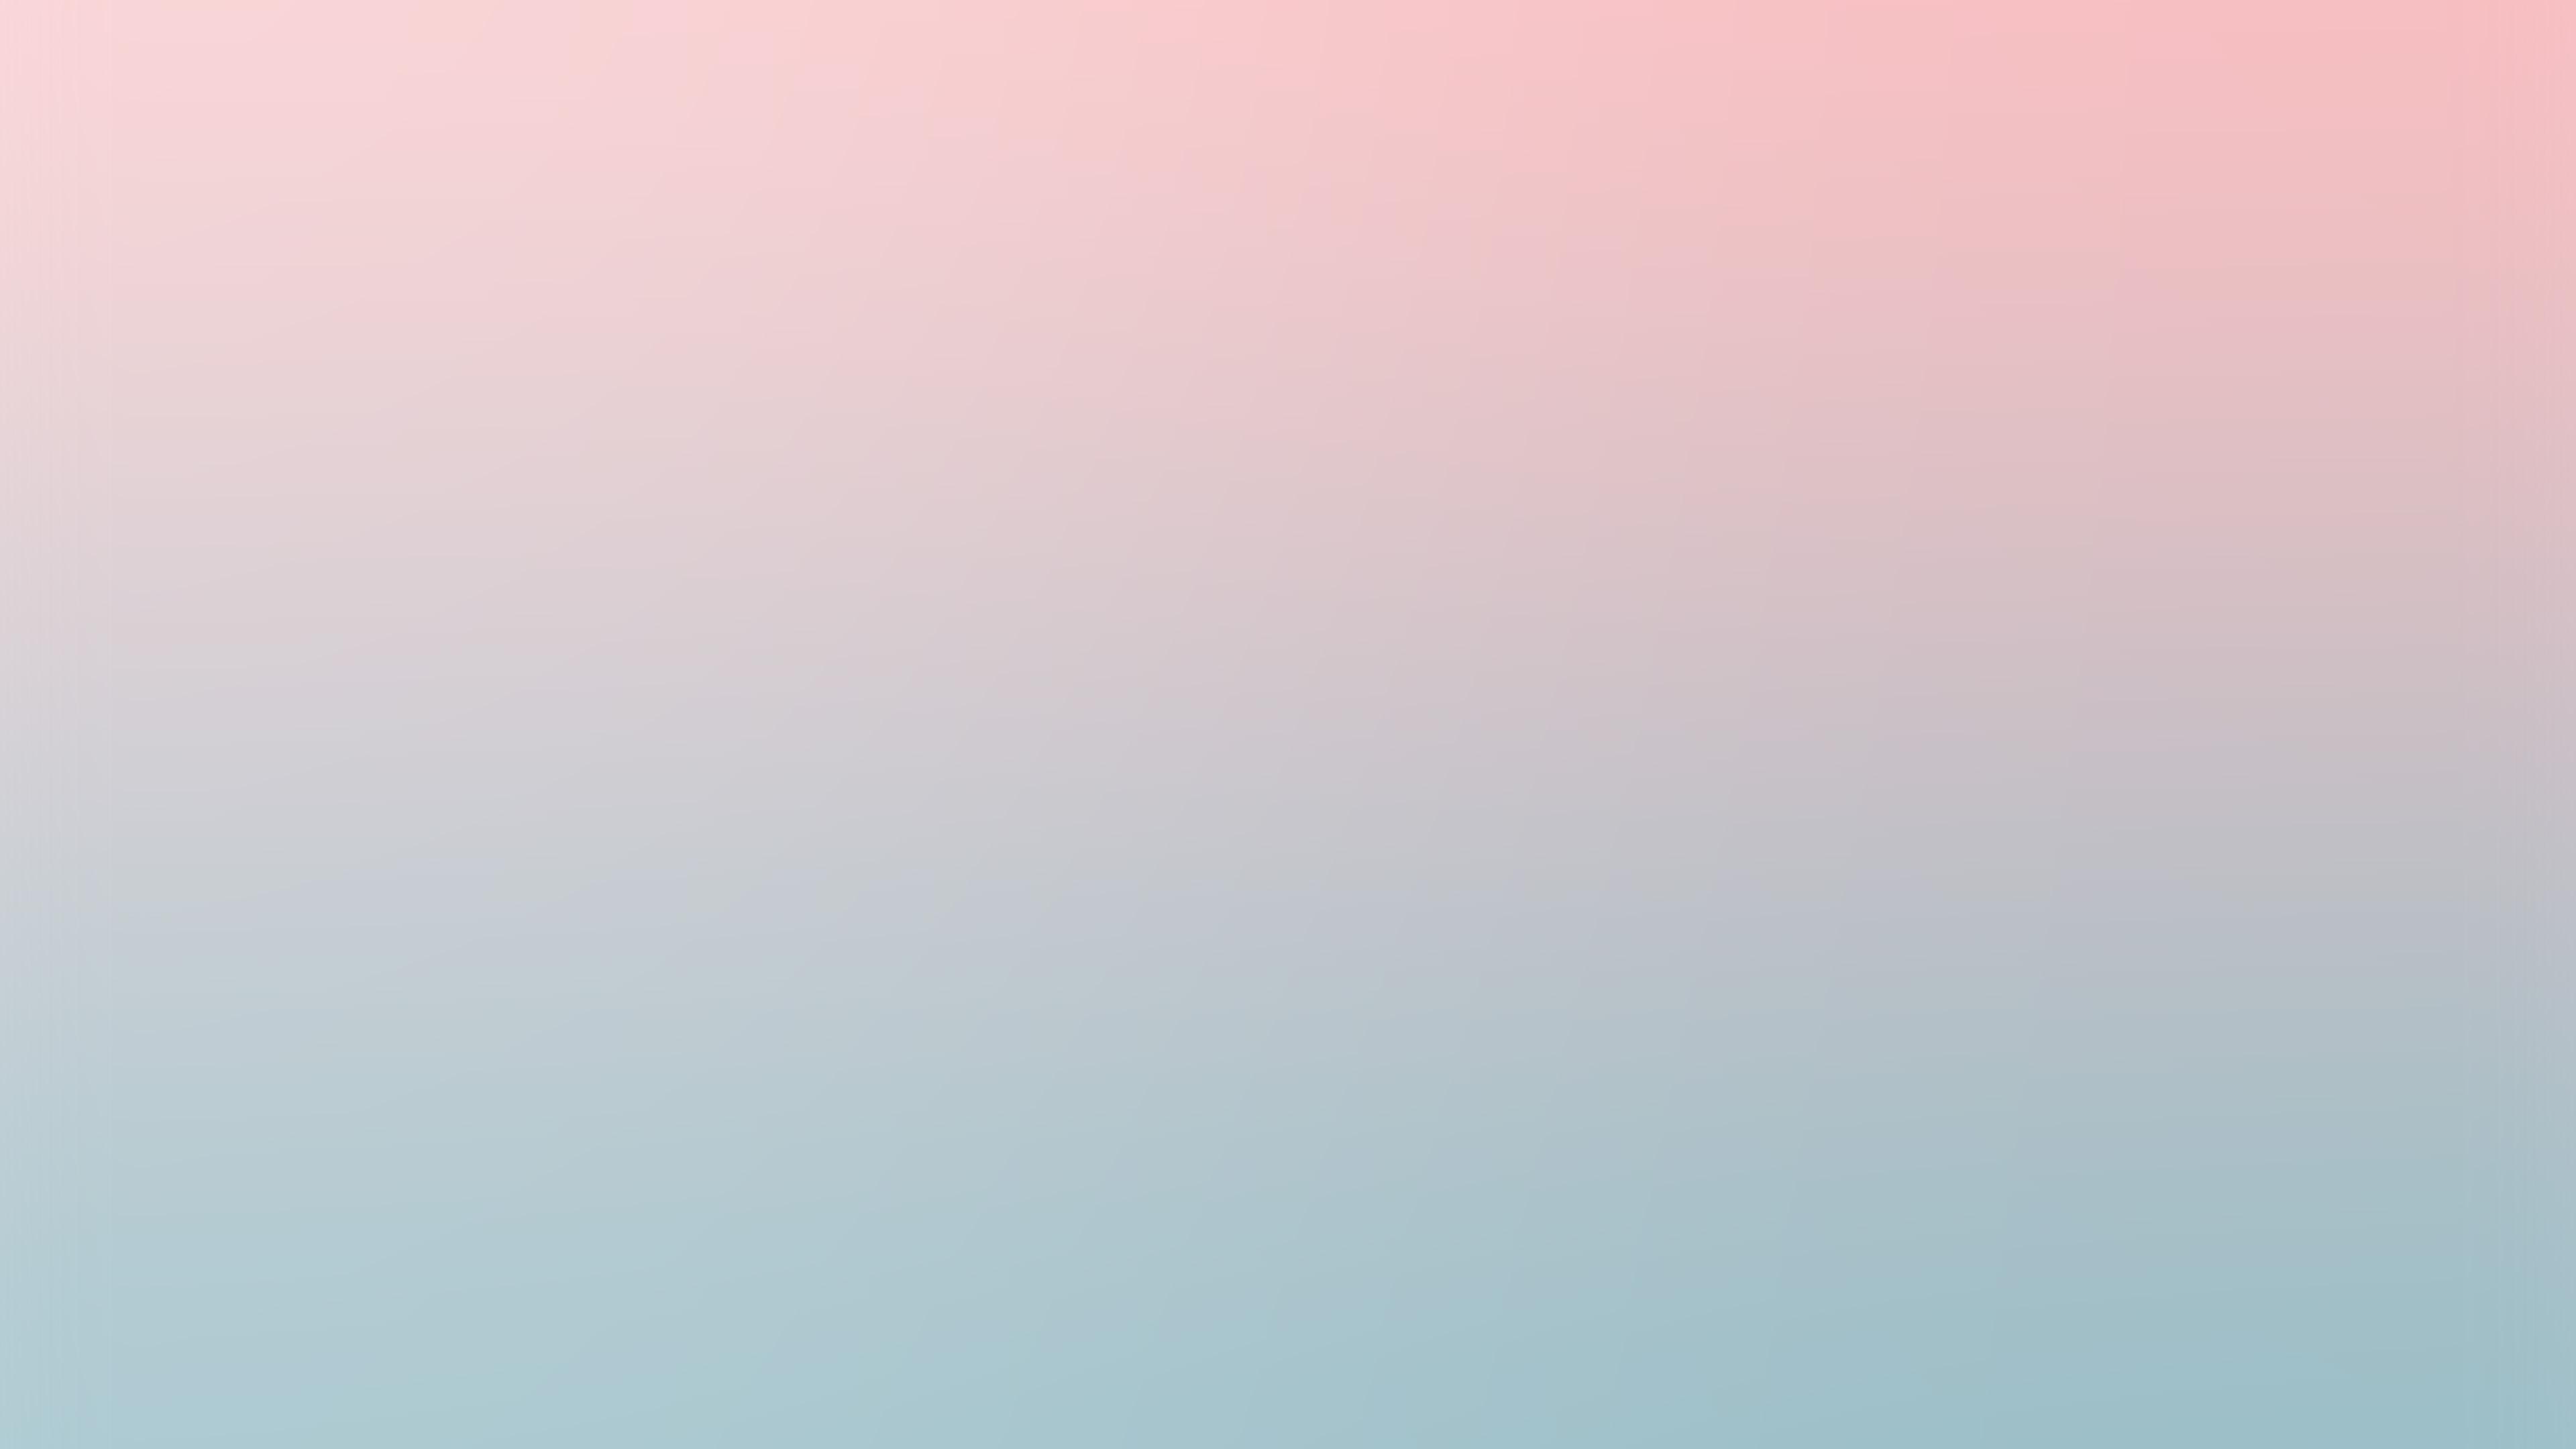 Sm07 Pink Blue Soft Pastel Blur Gradation Wallpaper